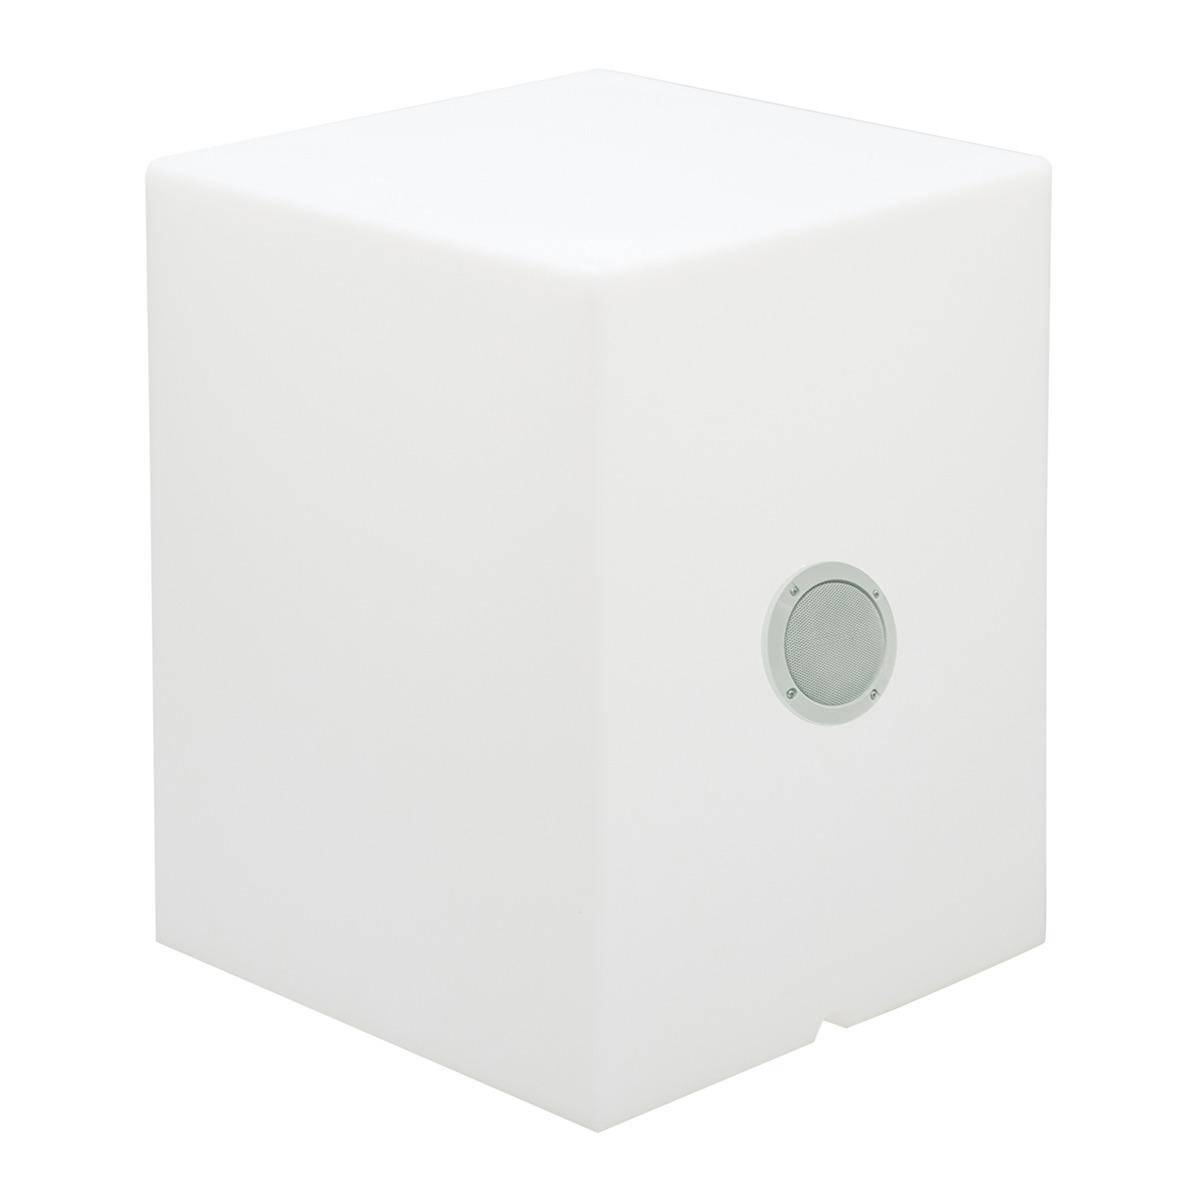 Cuby 32 cube iluminado Outdoor play batería recargable LED RGB 32x32x32cm